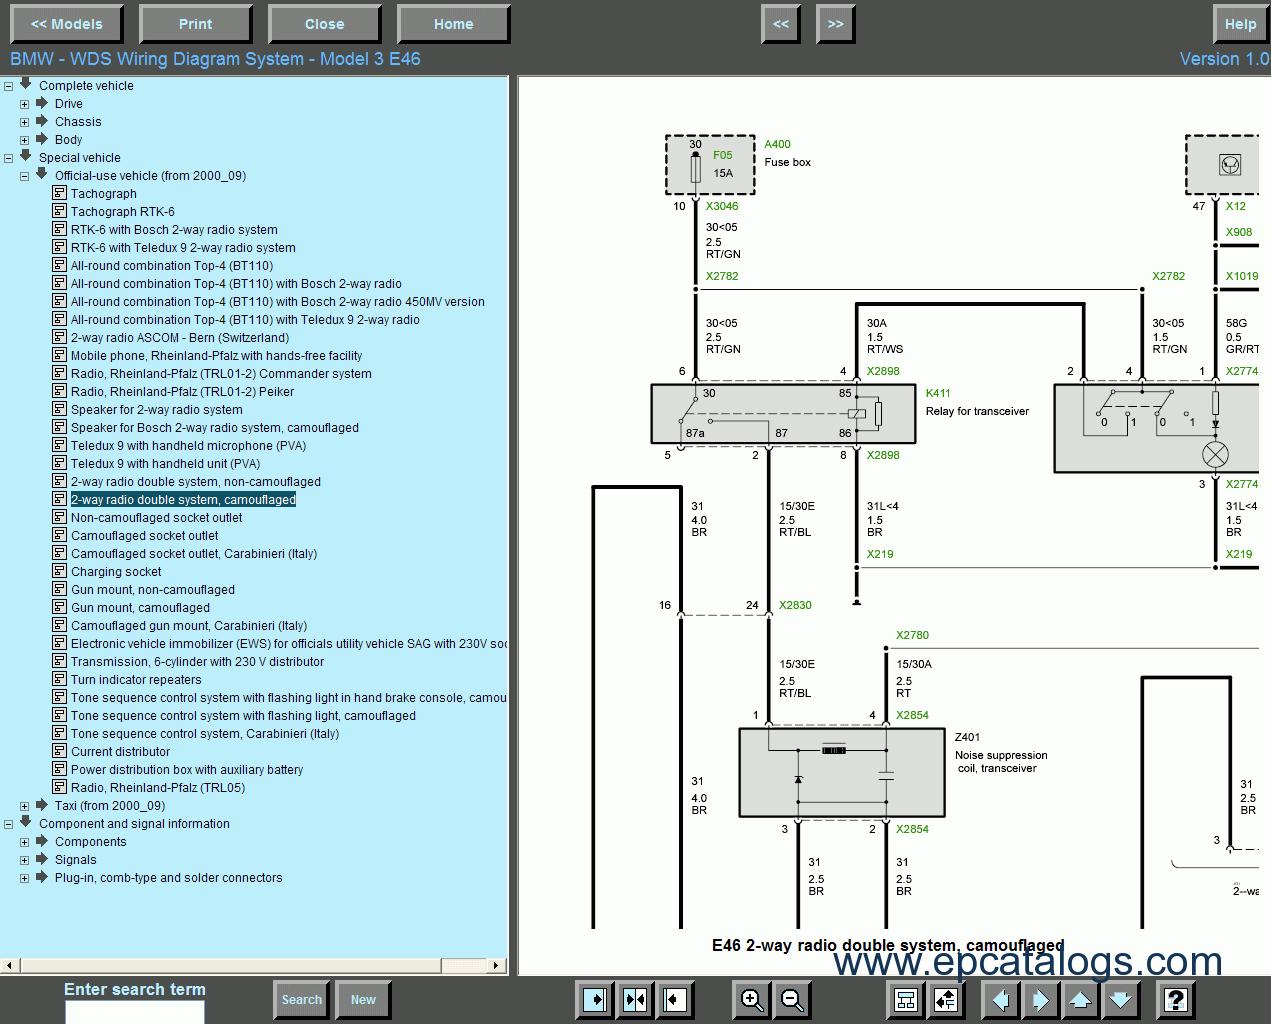 bmw e60 wiring diagram - wiring diagram sound-usage -  sound-usage.agriturismoduemadonne.it  agriturismoduemadonne.it